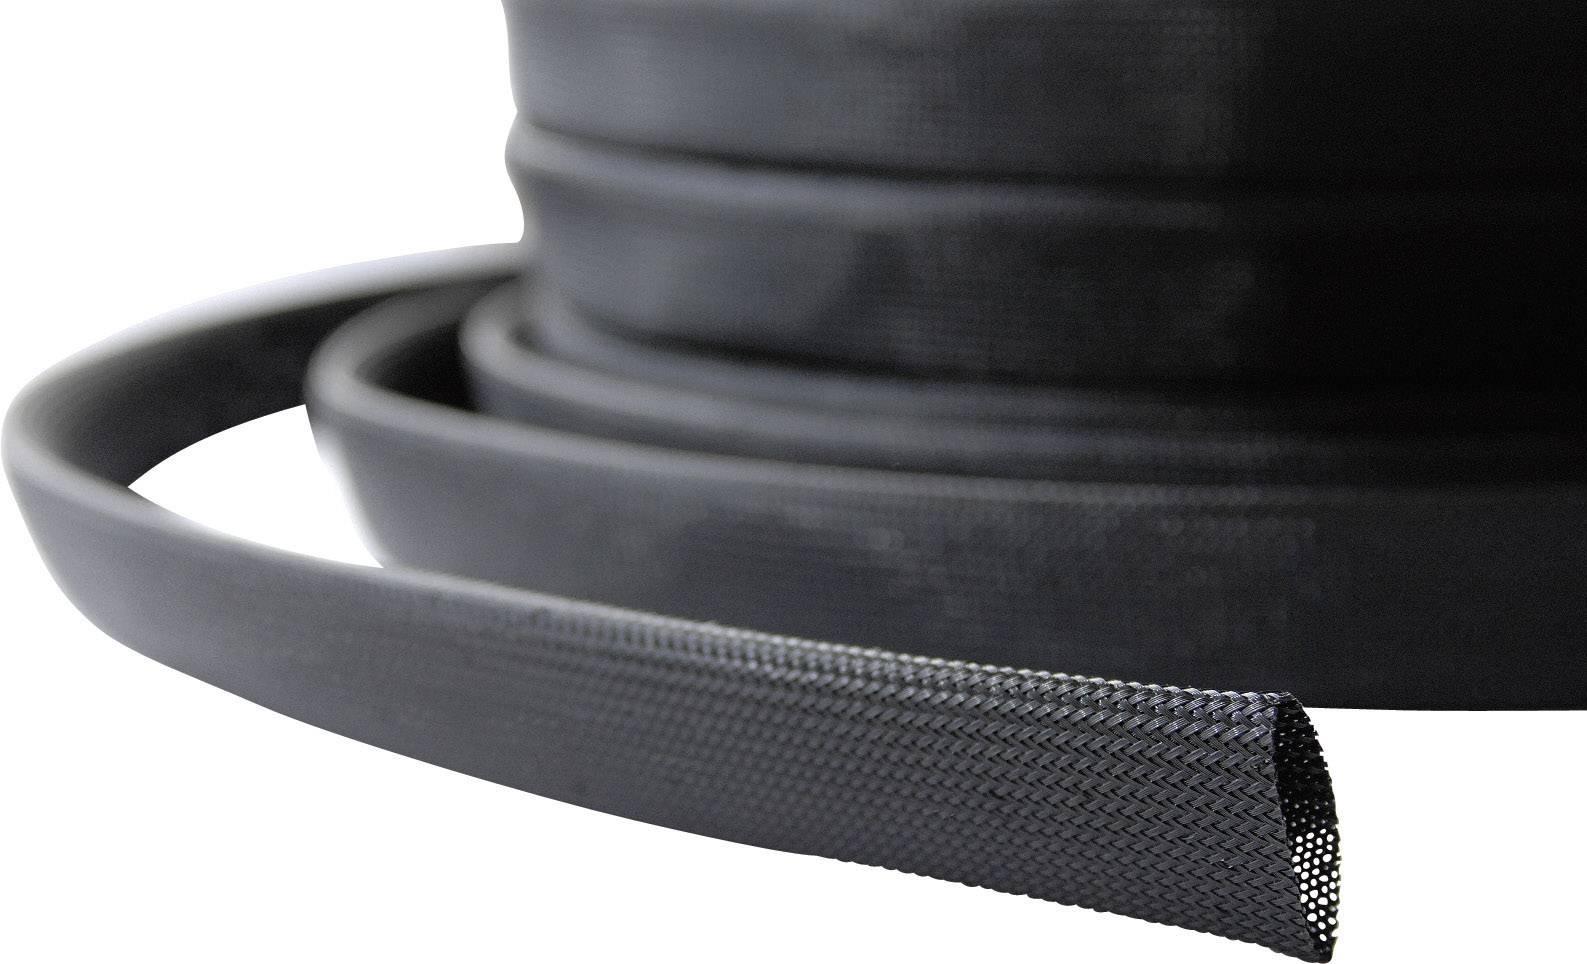 Ochranný oplet LappKabel SILVYN® BRAID PA6 NW, 10 do 14 mm, -55 do +125 °C, 15 m, čierna